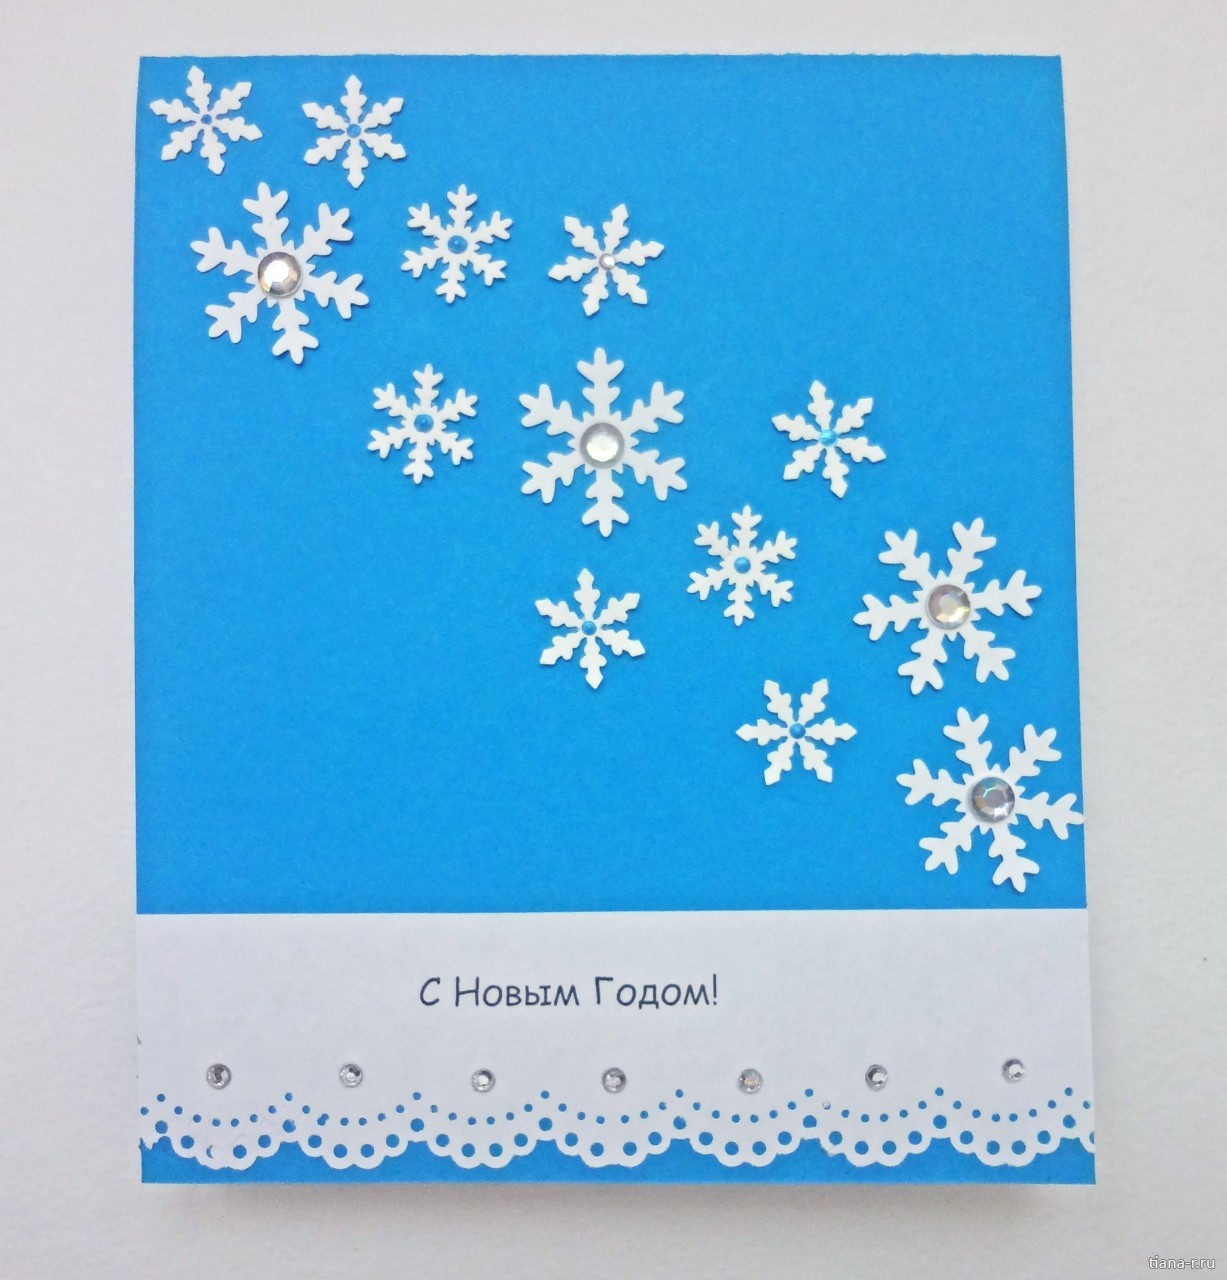 можете открытки со снежинками и елками наращивание ресниц